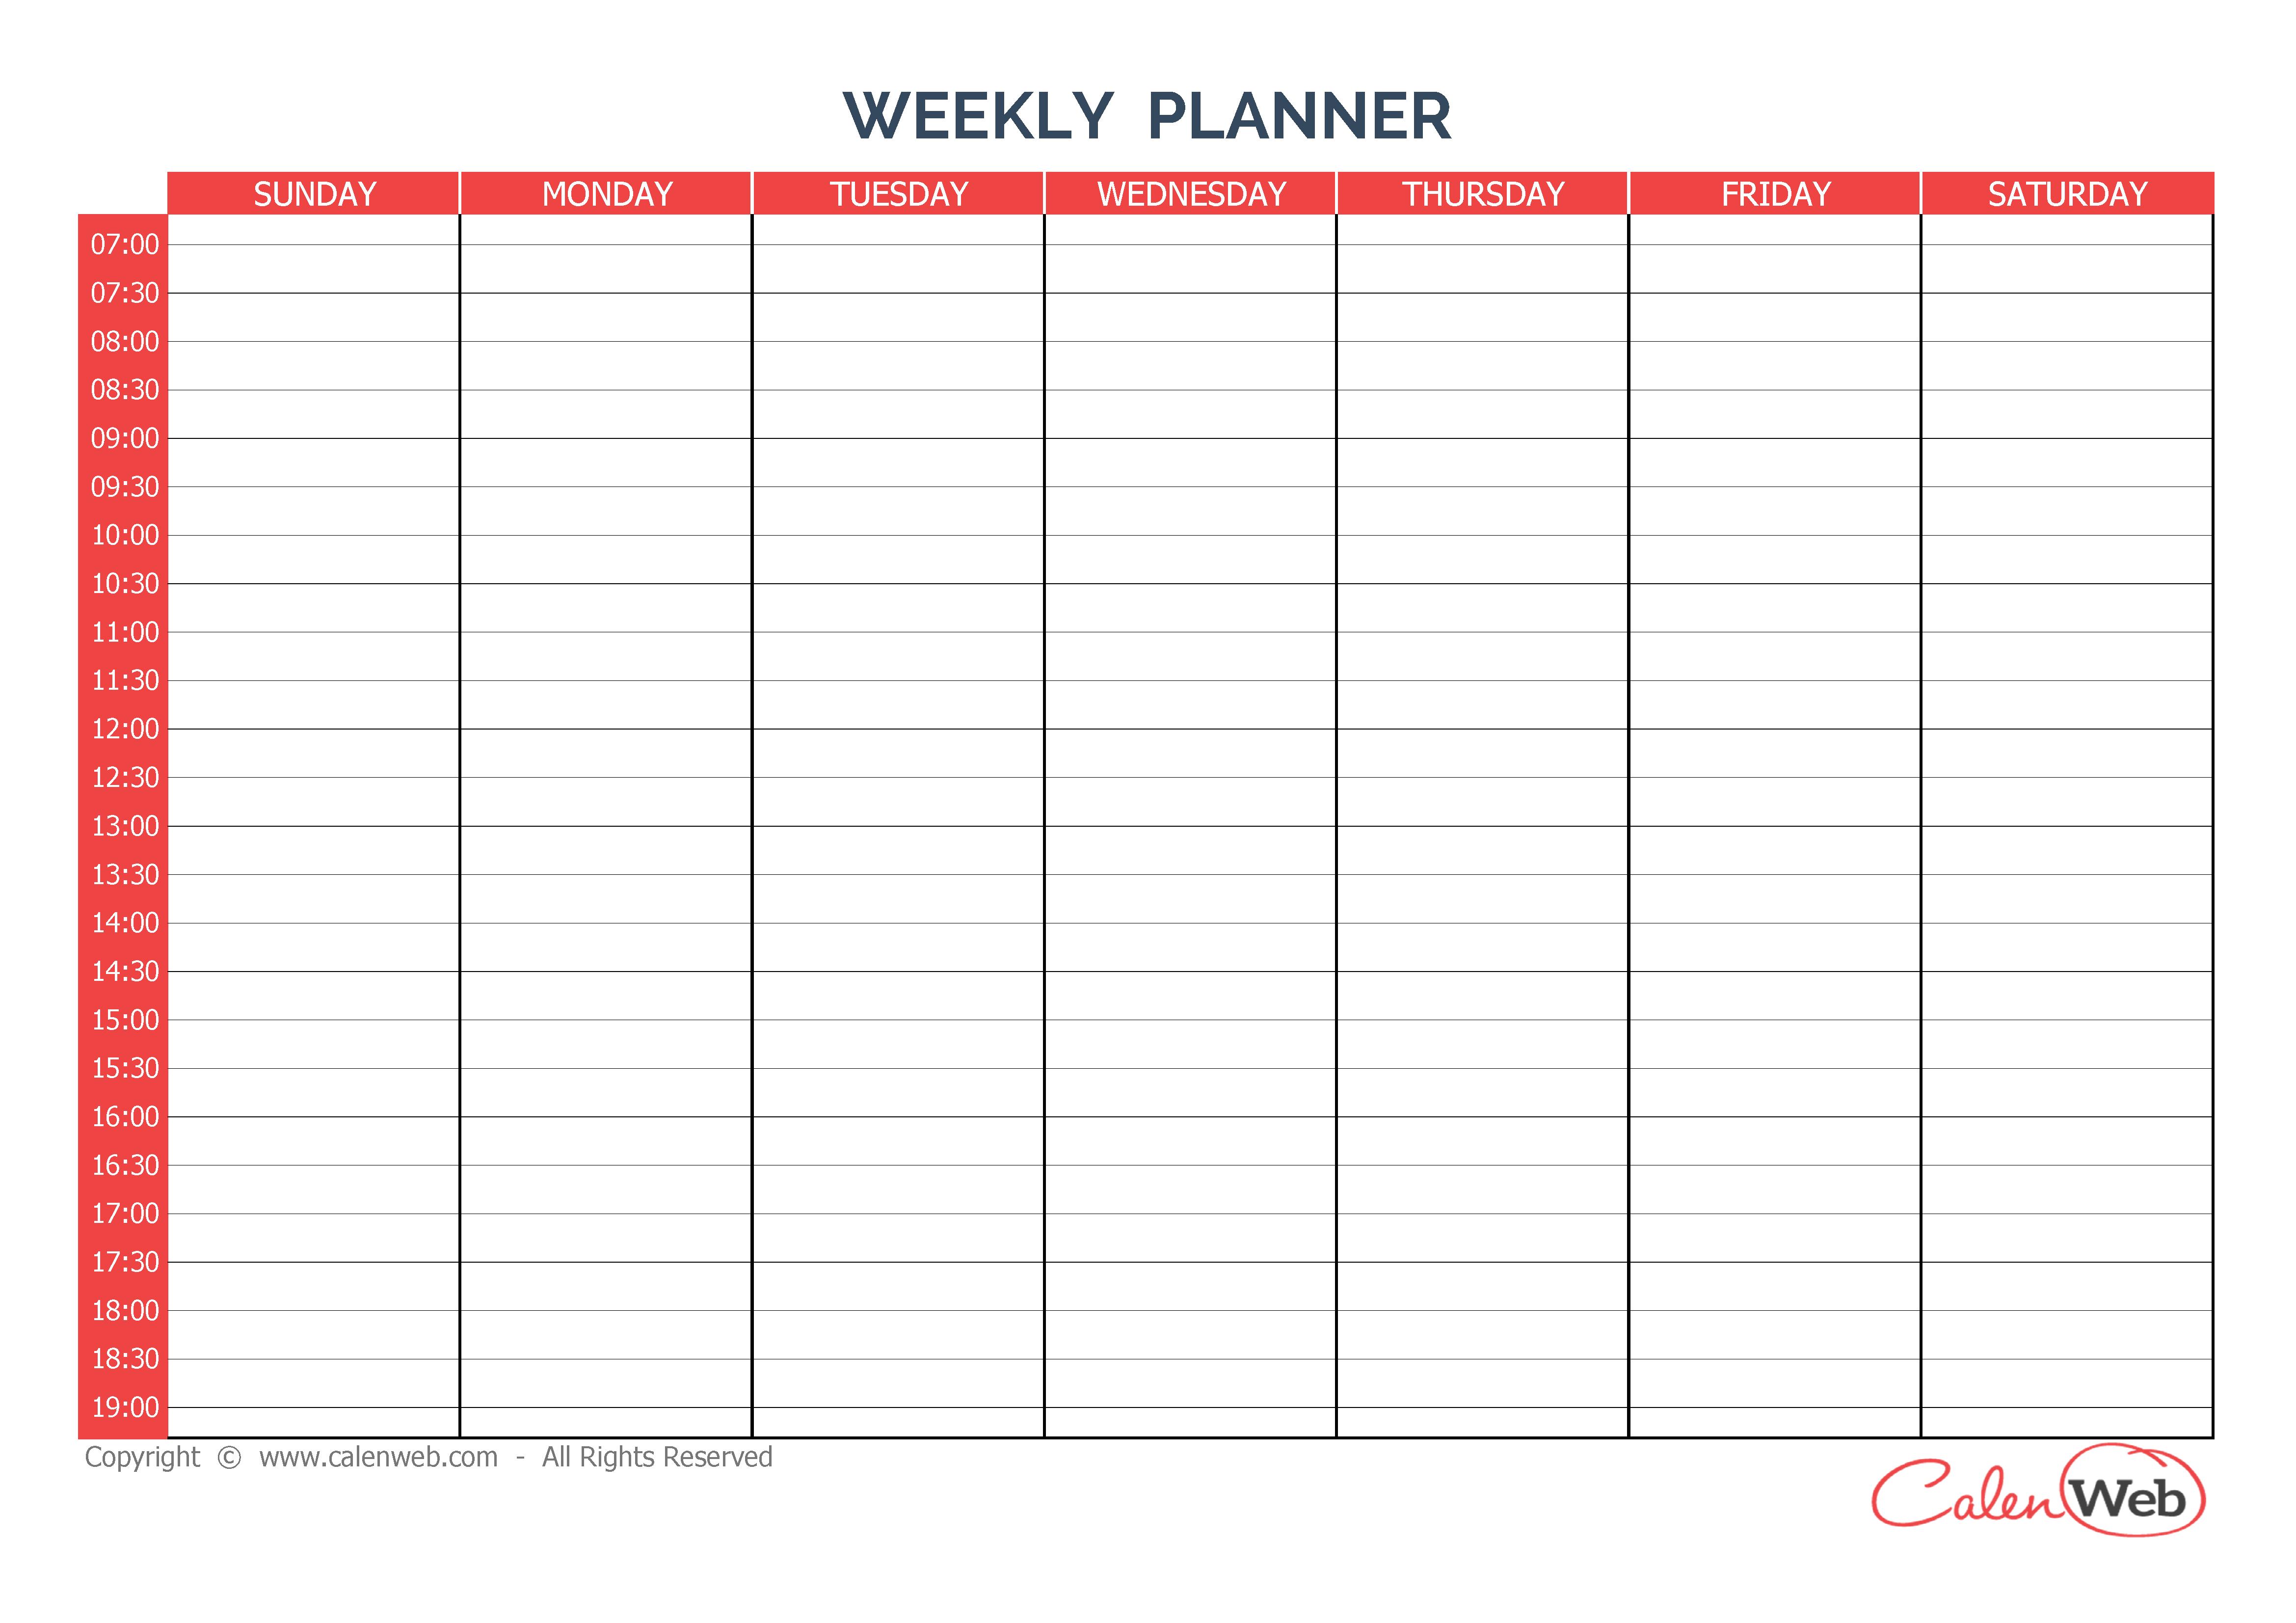 Calendriers Hebdomadaires - Calenweb Sunday Through Saturday Blanl Calendar